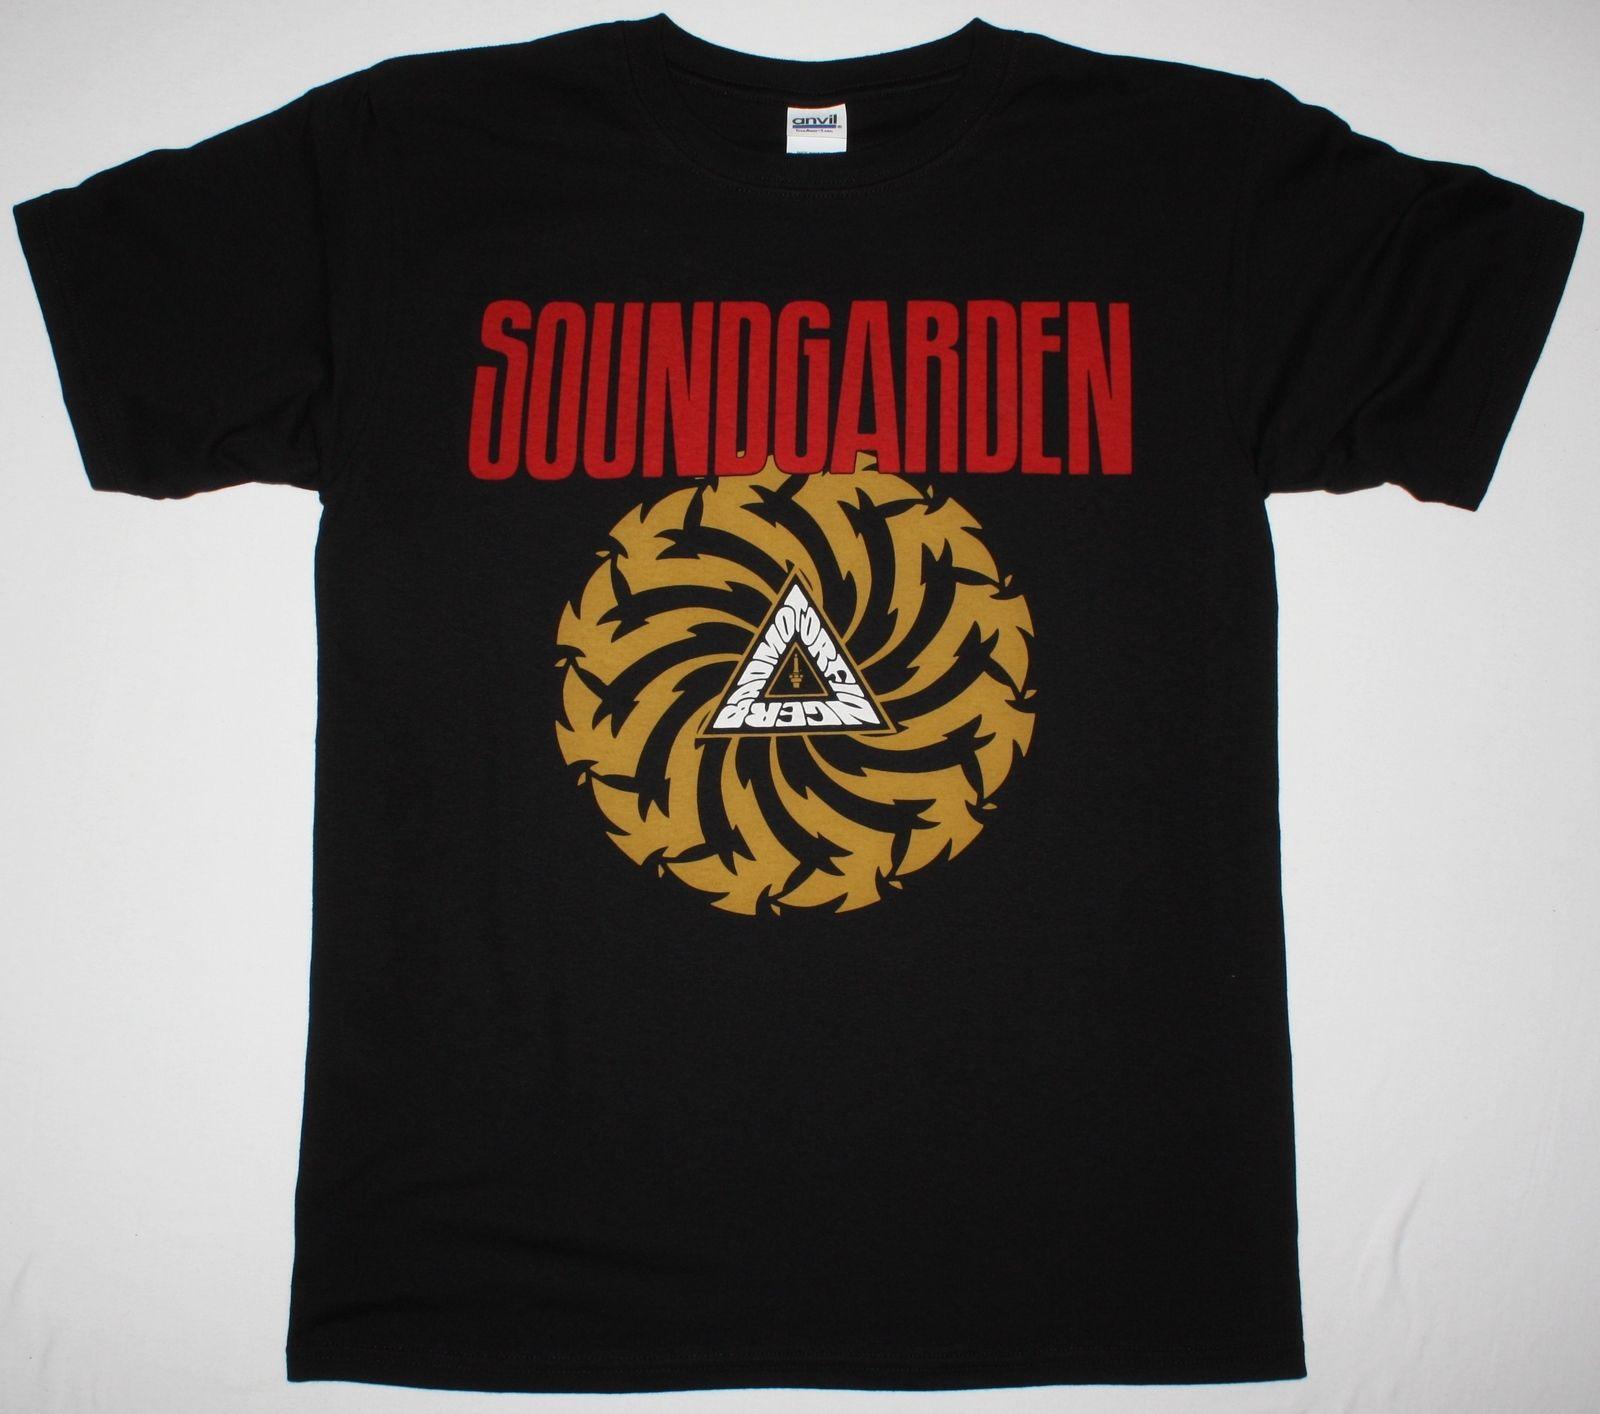 Soundgarden badmotorfinger 39 92 audioslave grunerge seattle for Group t shirts cheap